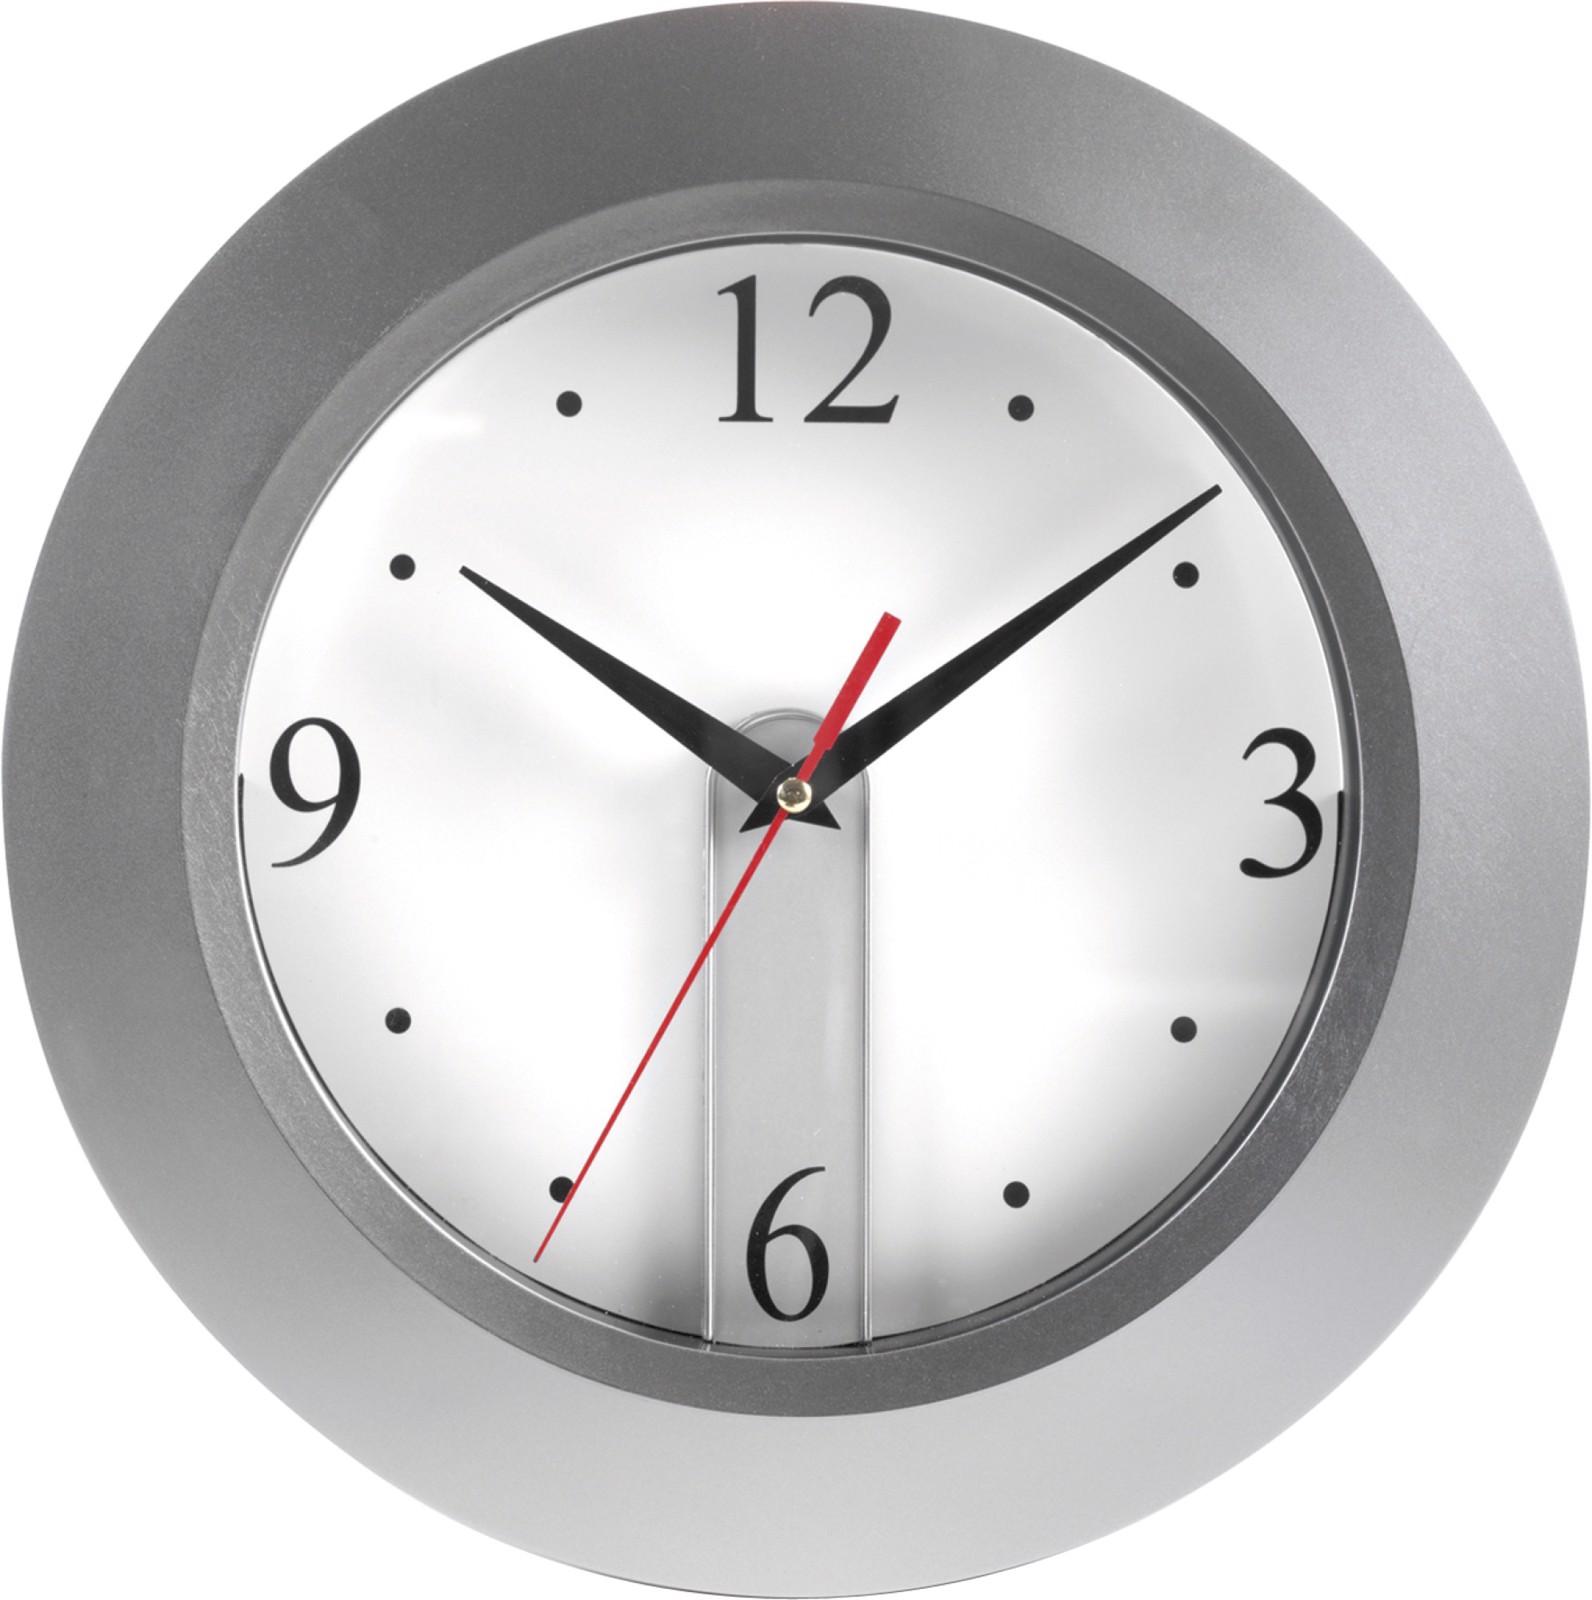 ABS wall clock